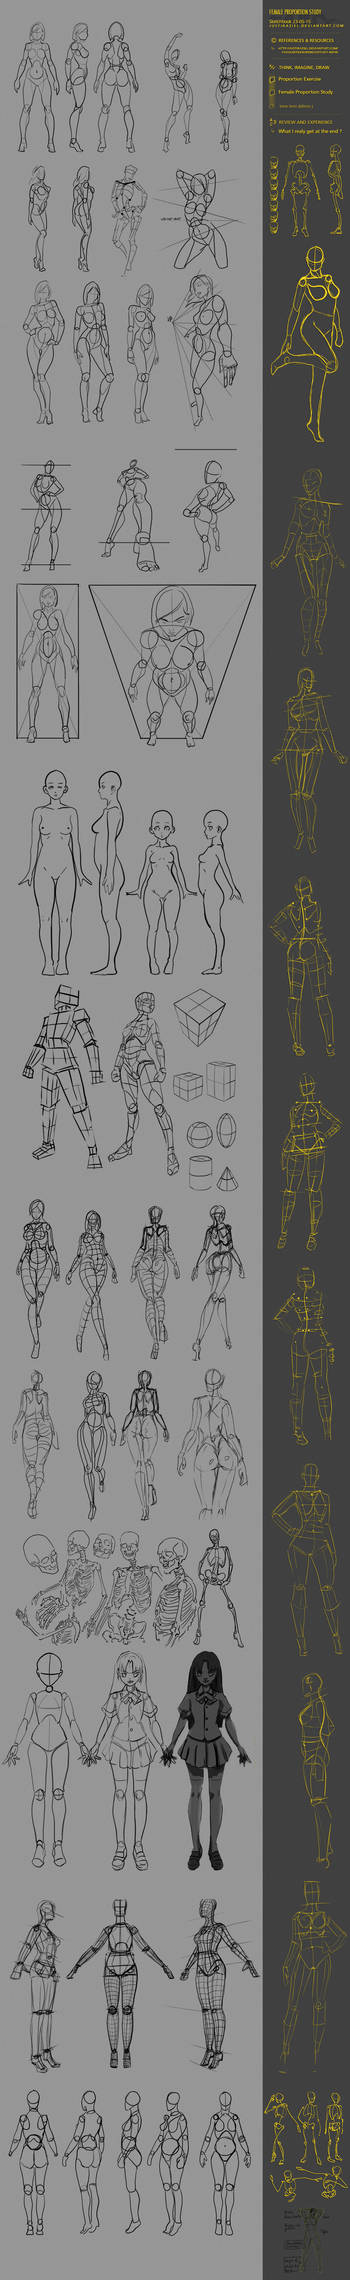 20150523 Sketchdump